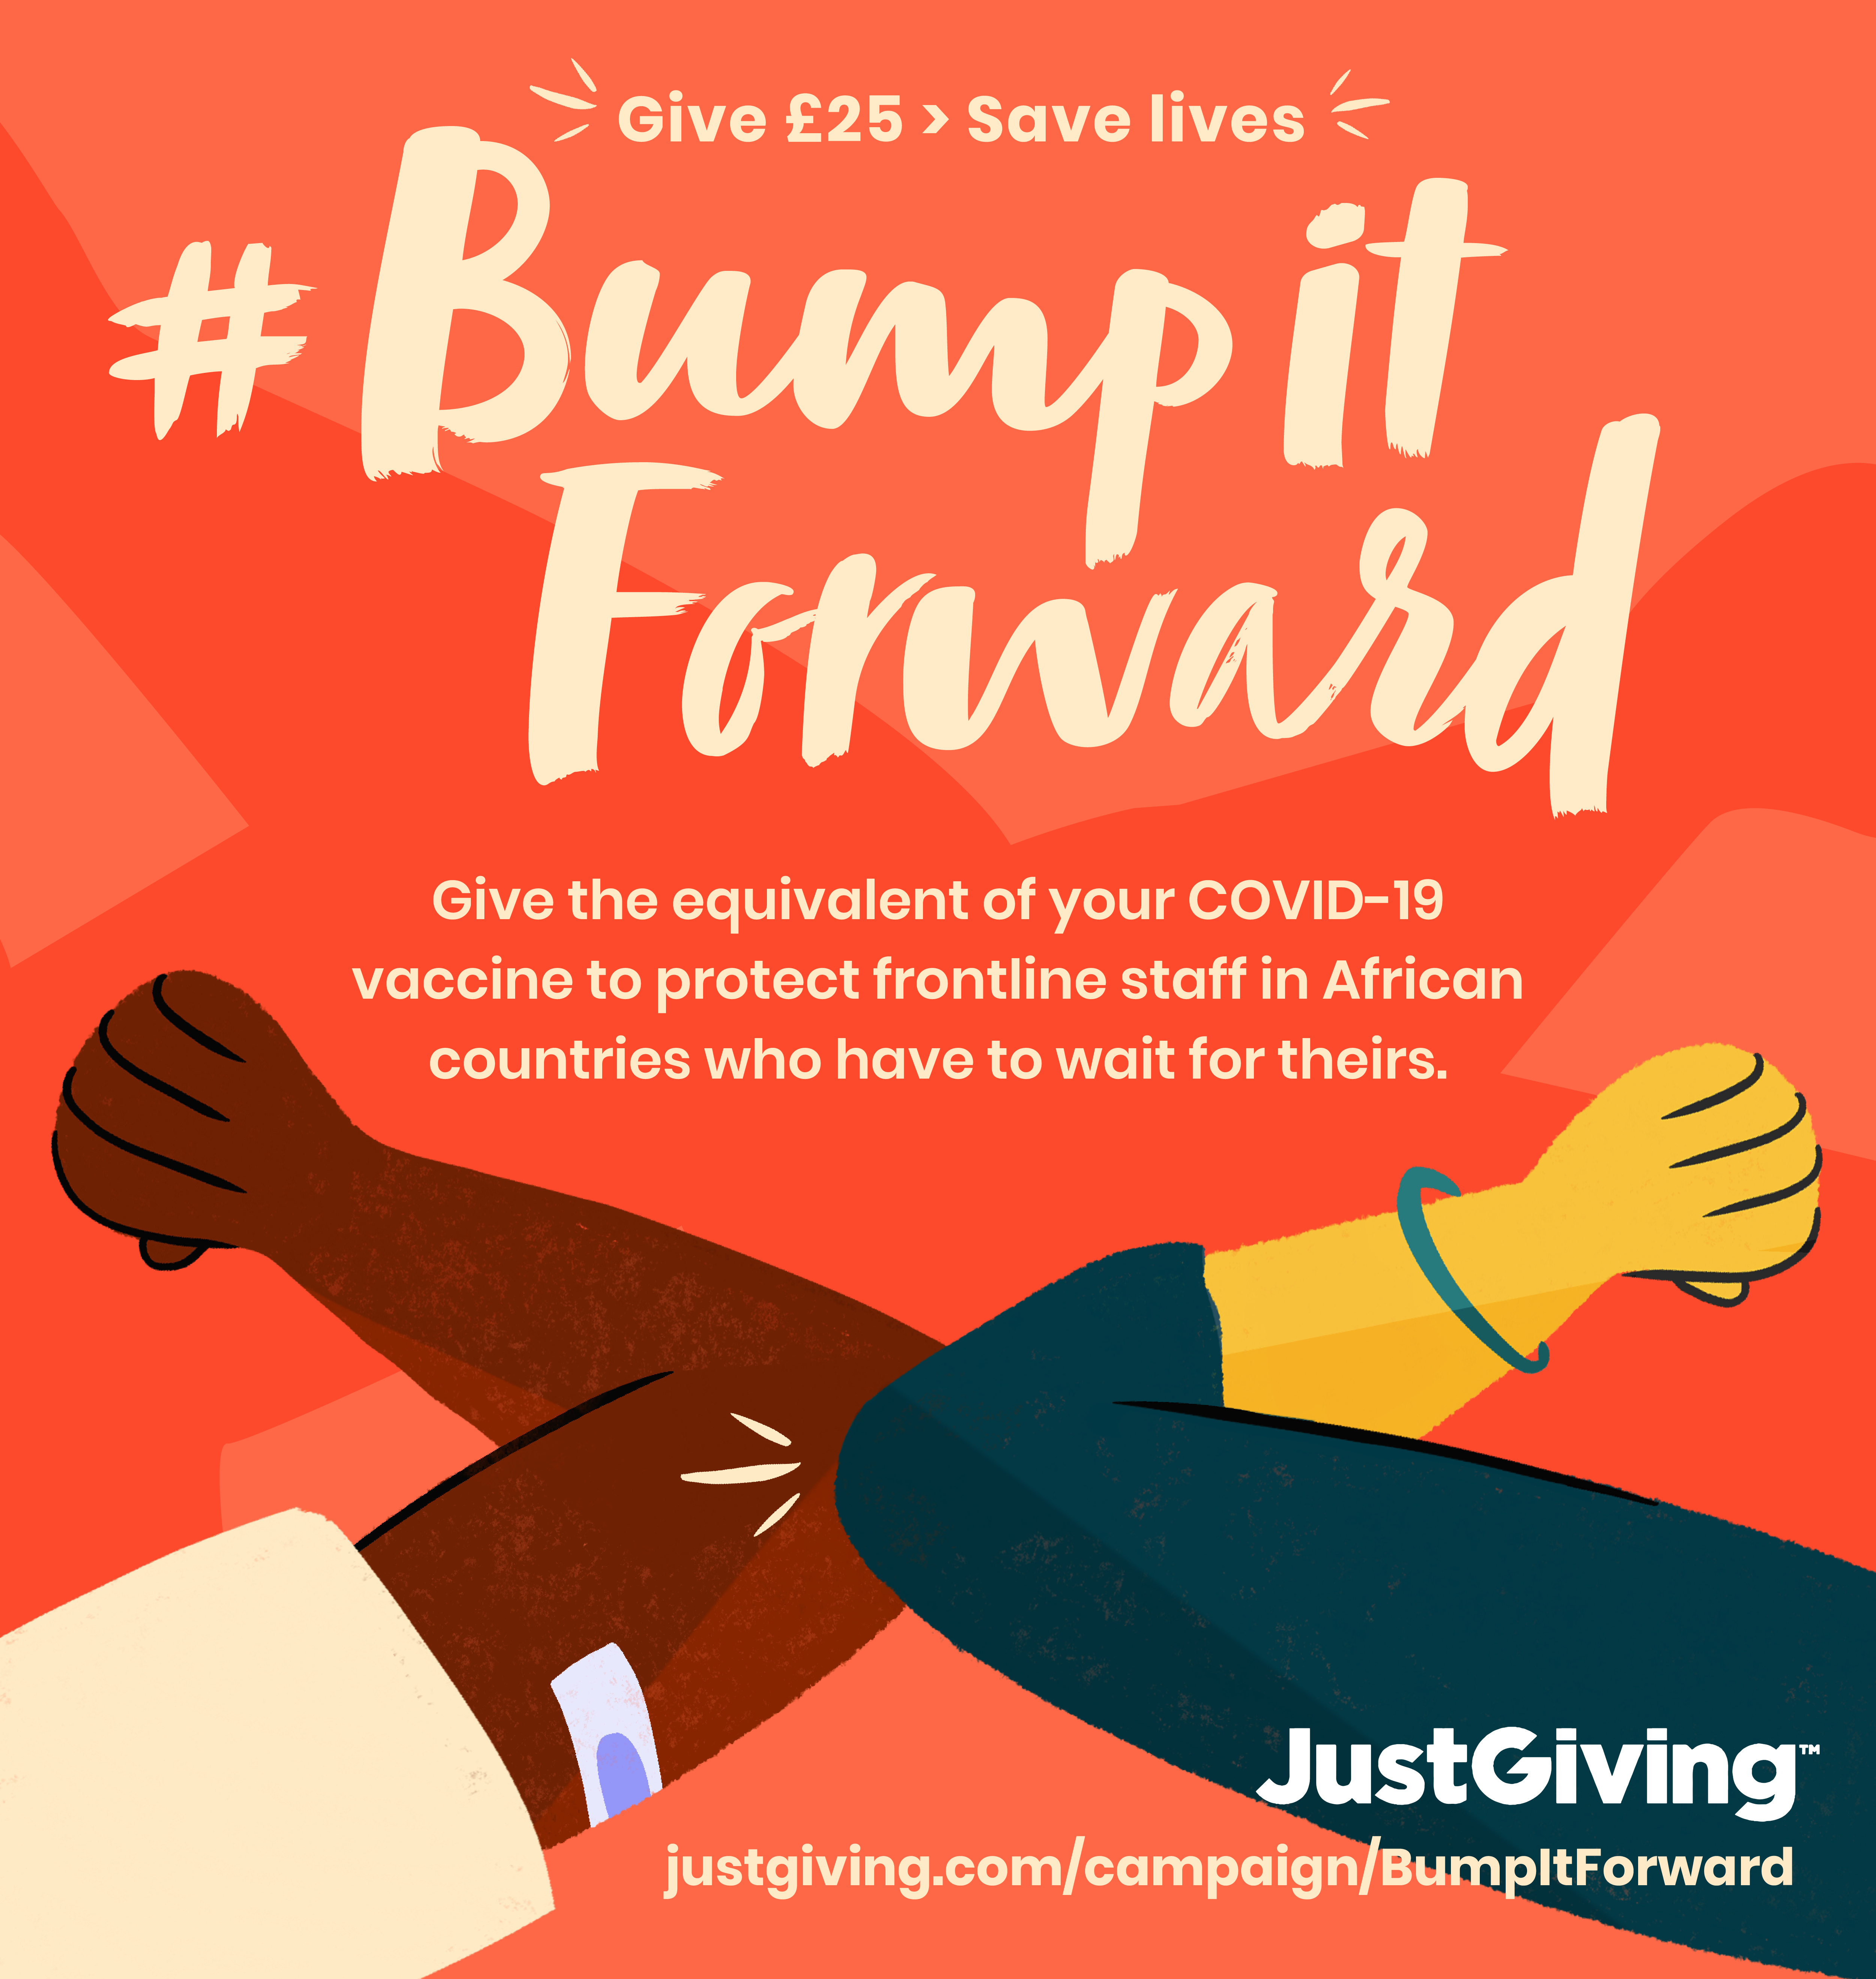 Fundraising for #BumpItForward